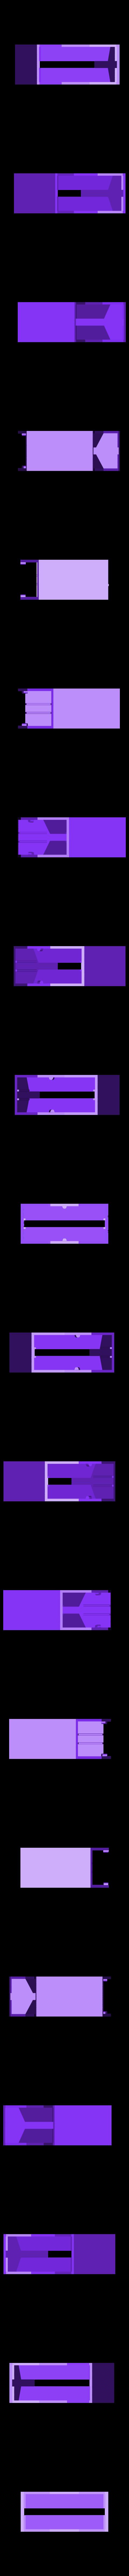 curedent_coque.STL Download STL file Magic toothpick dispenser • Object to 3D print, ffmicka